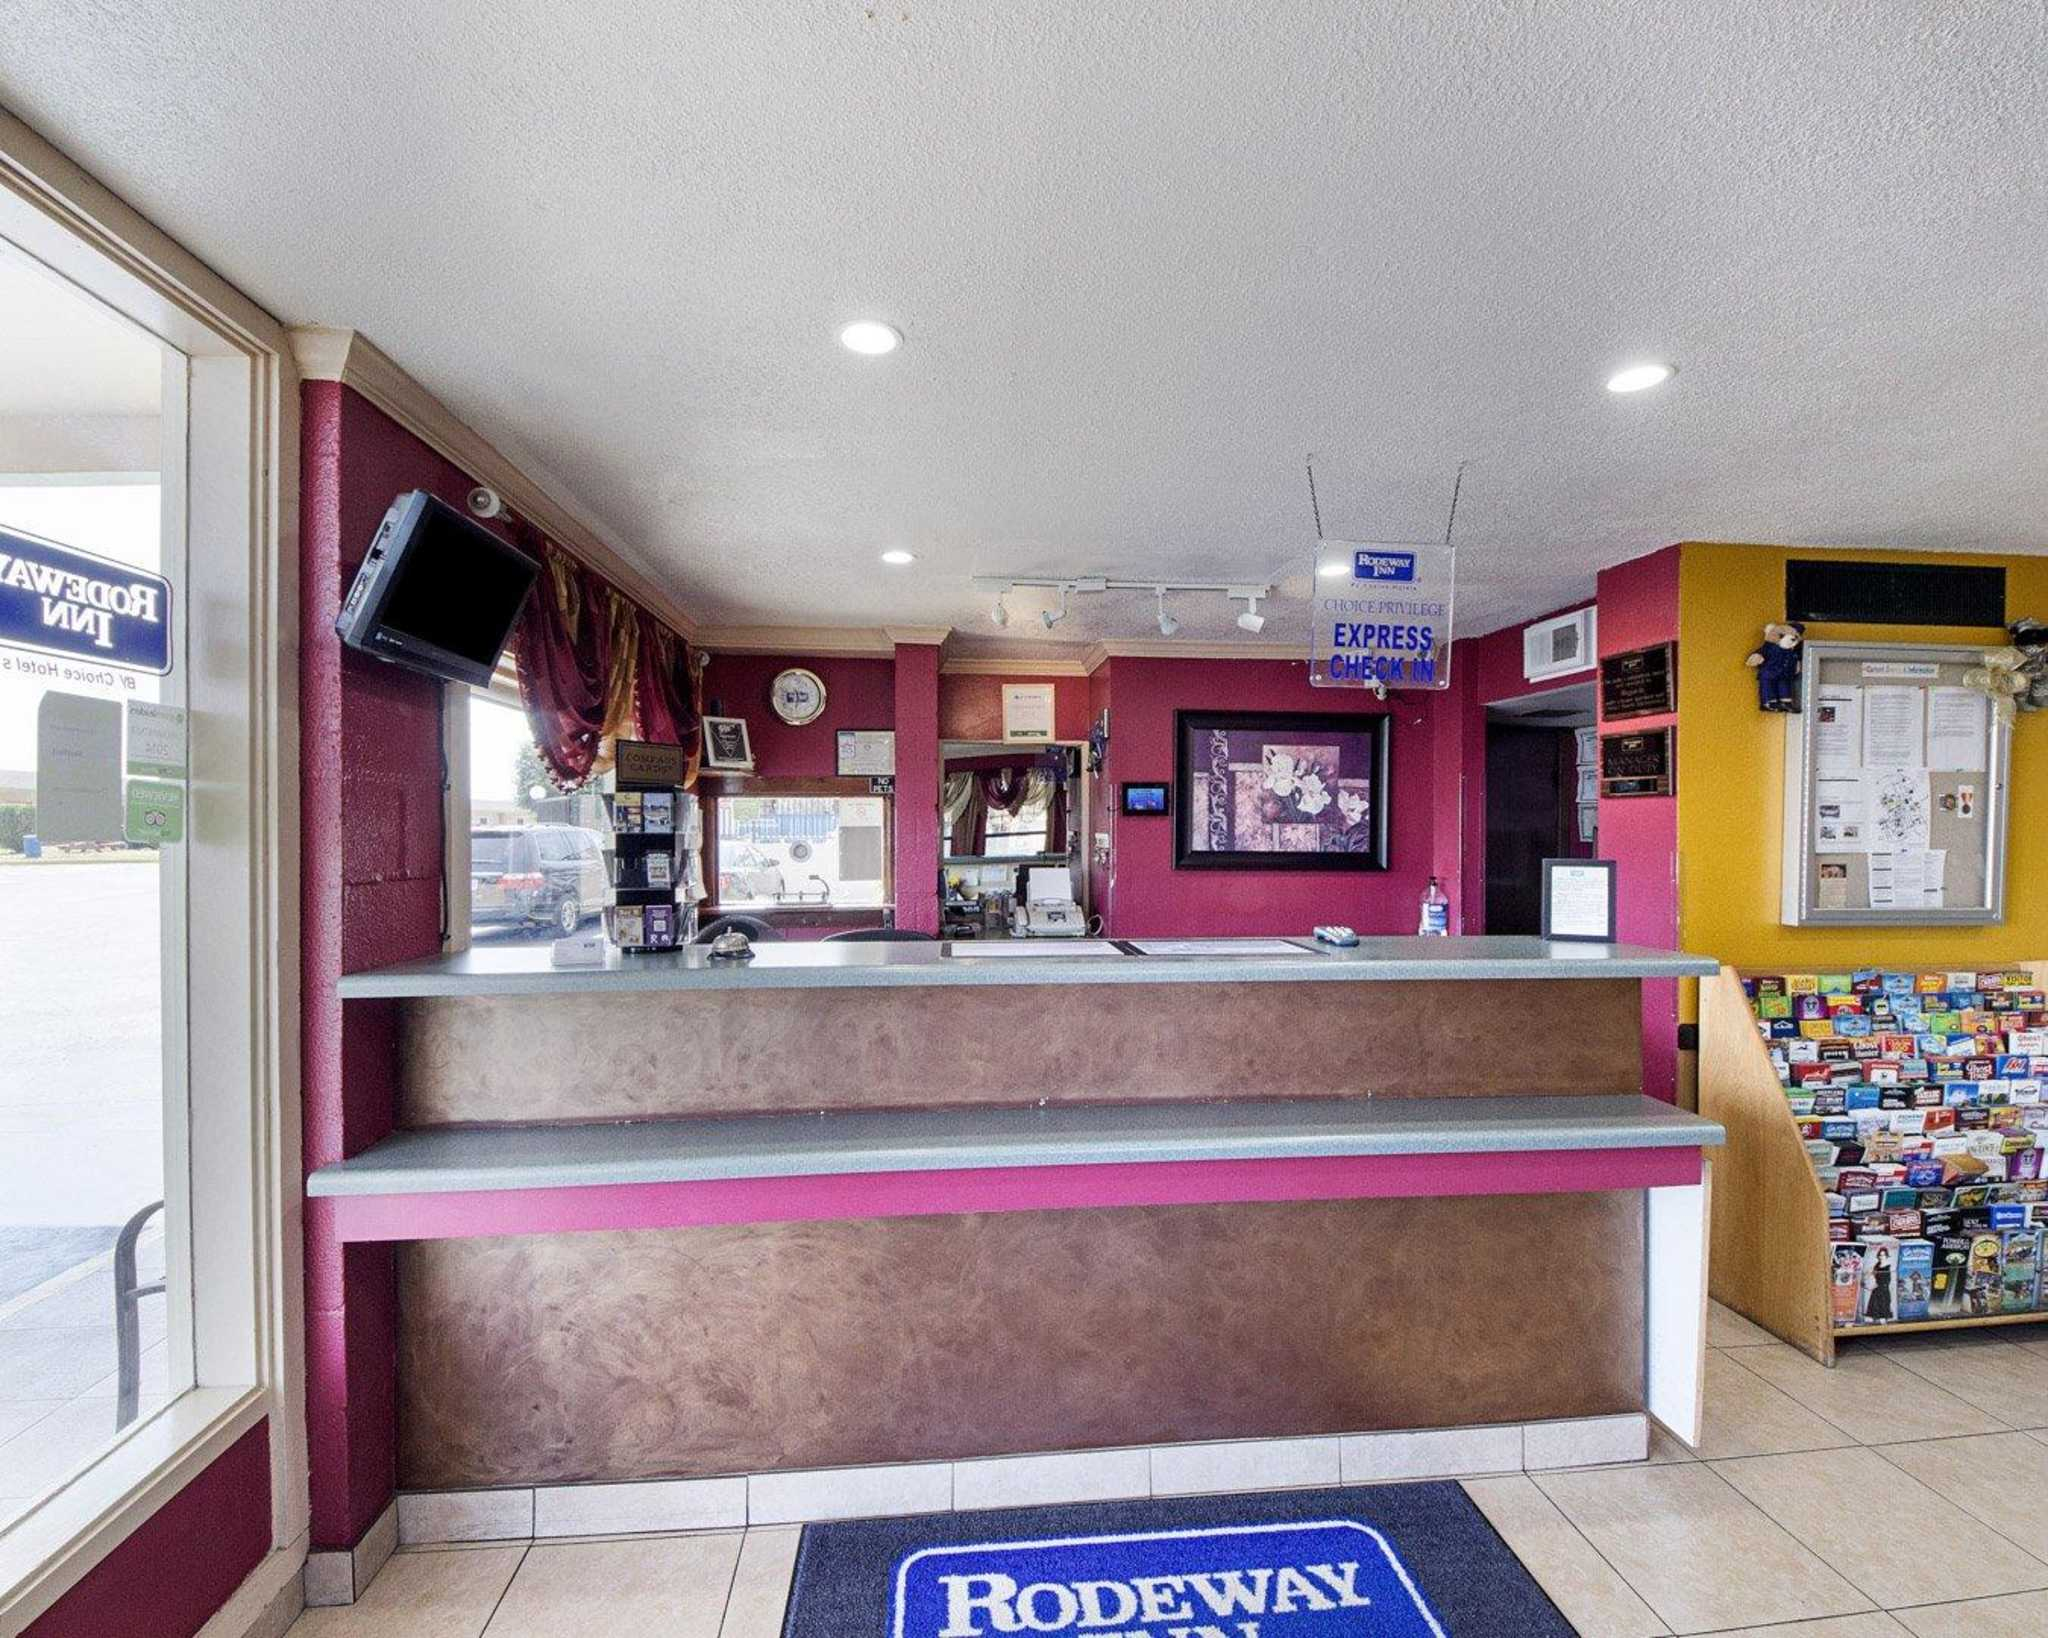 Rodeway Inn At Lackland AFB image 16